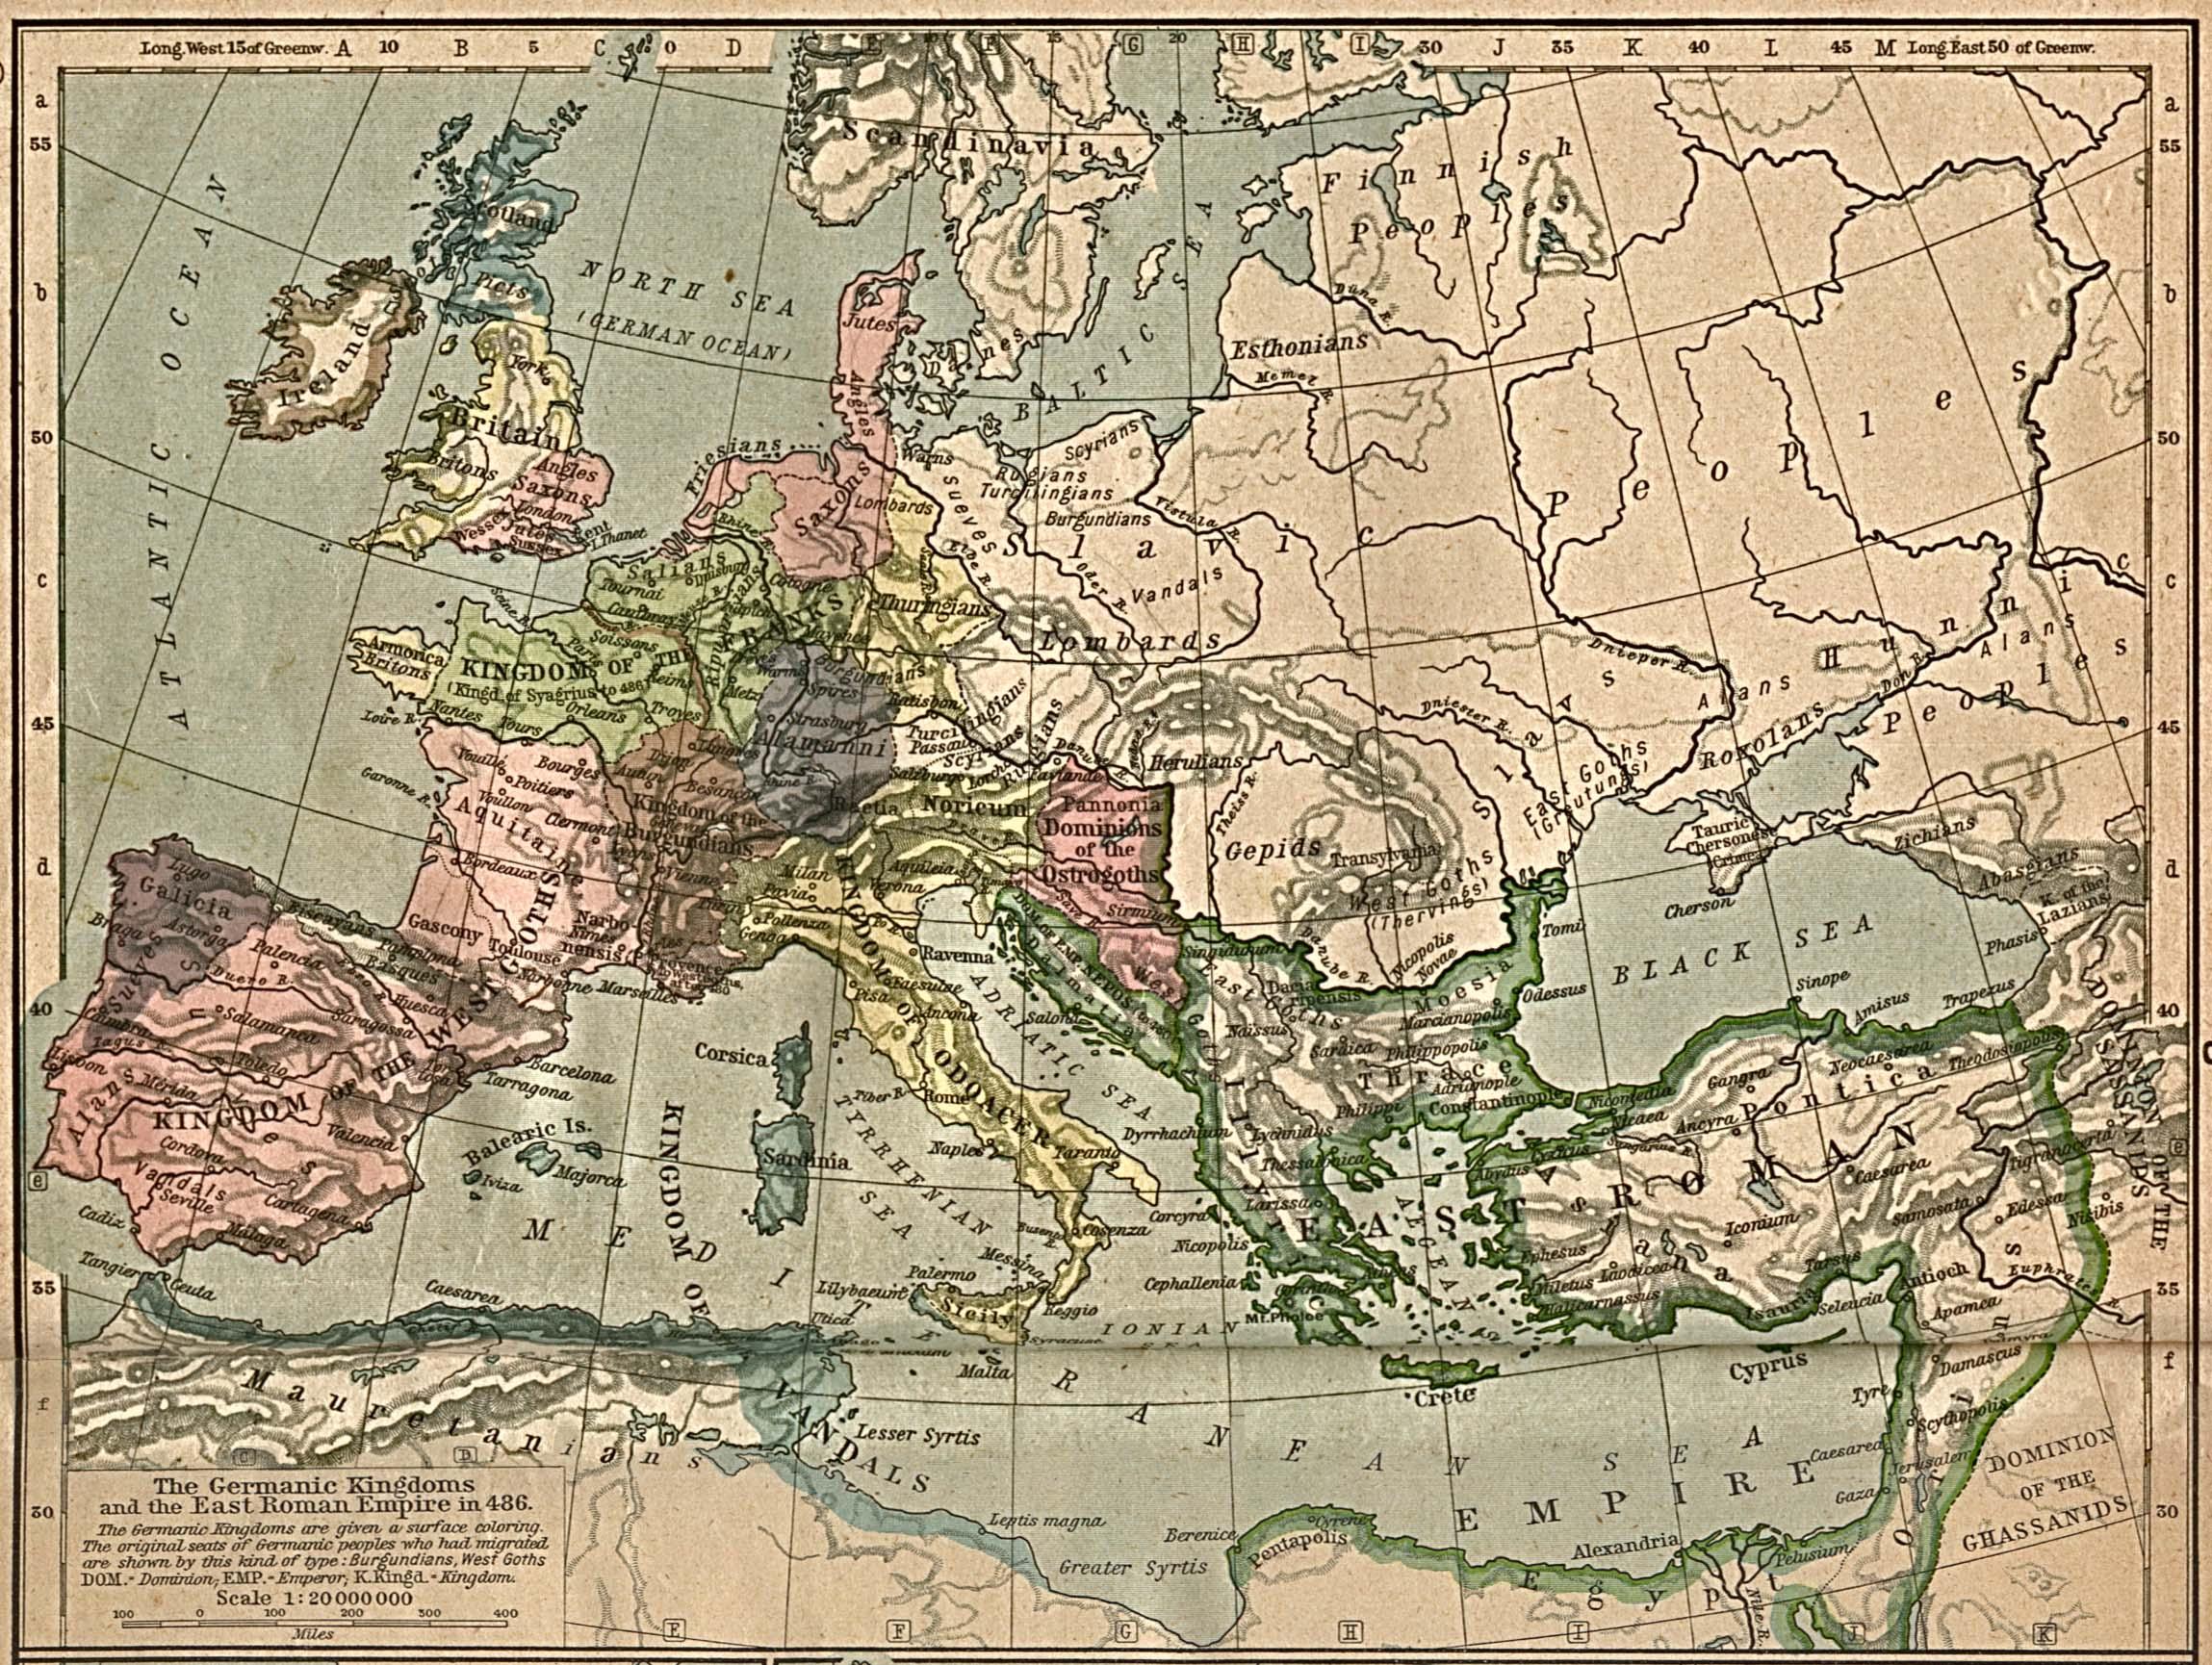 WHKMLA Historical Atlas Spain Page